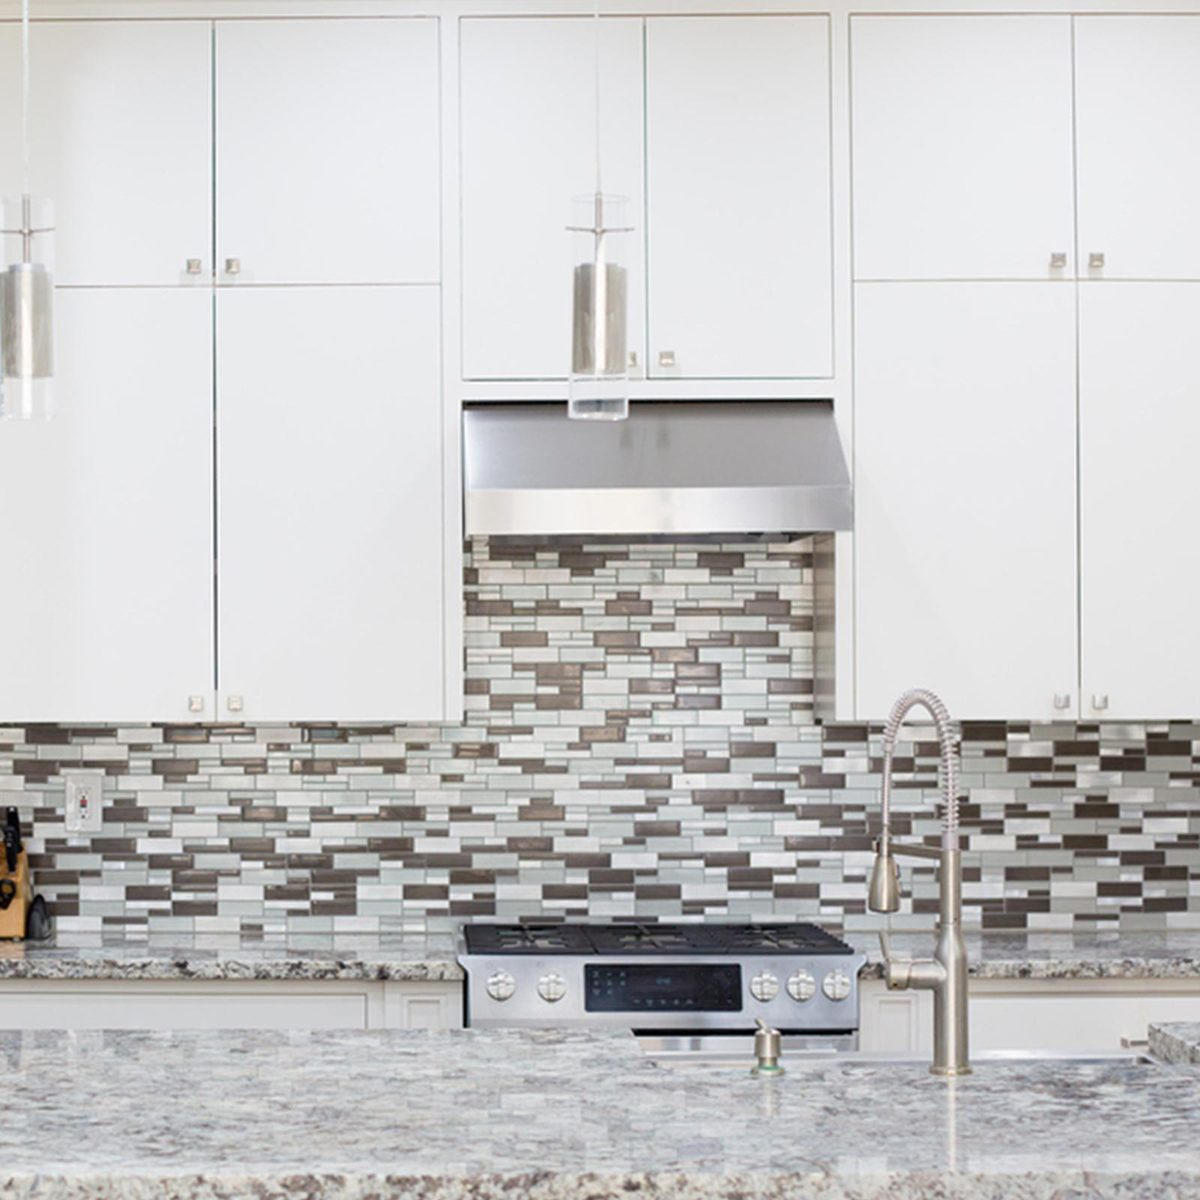 Backsplash in a kitchen